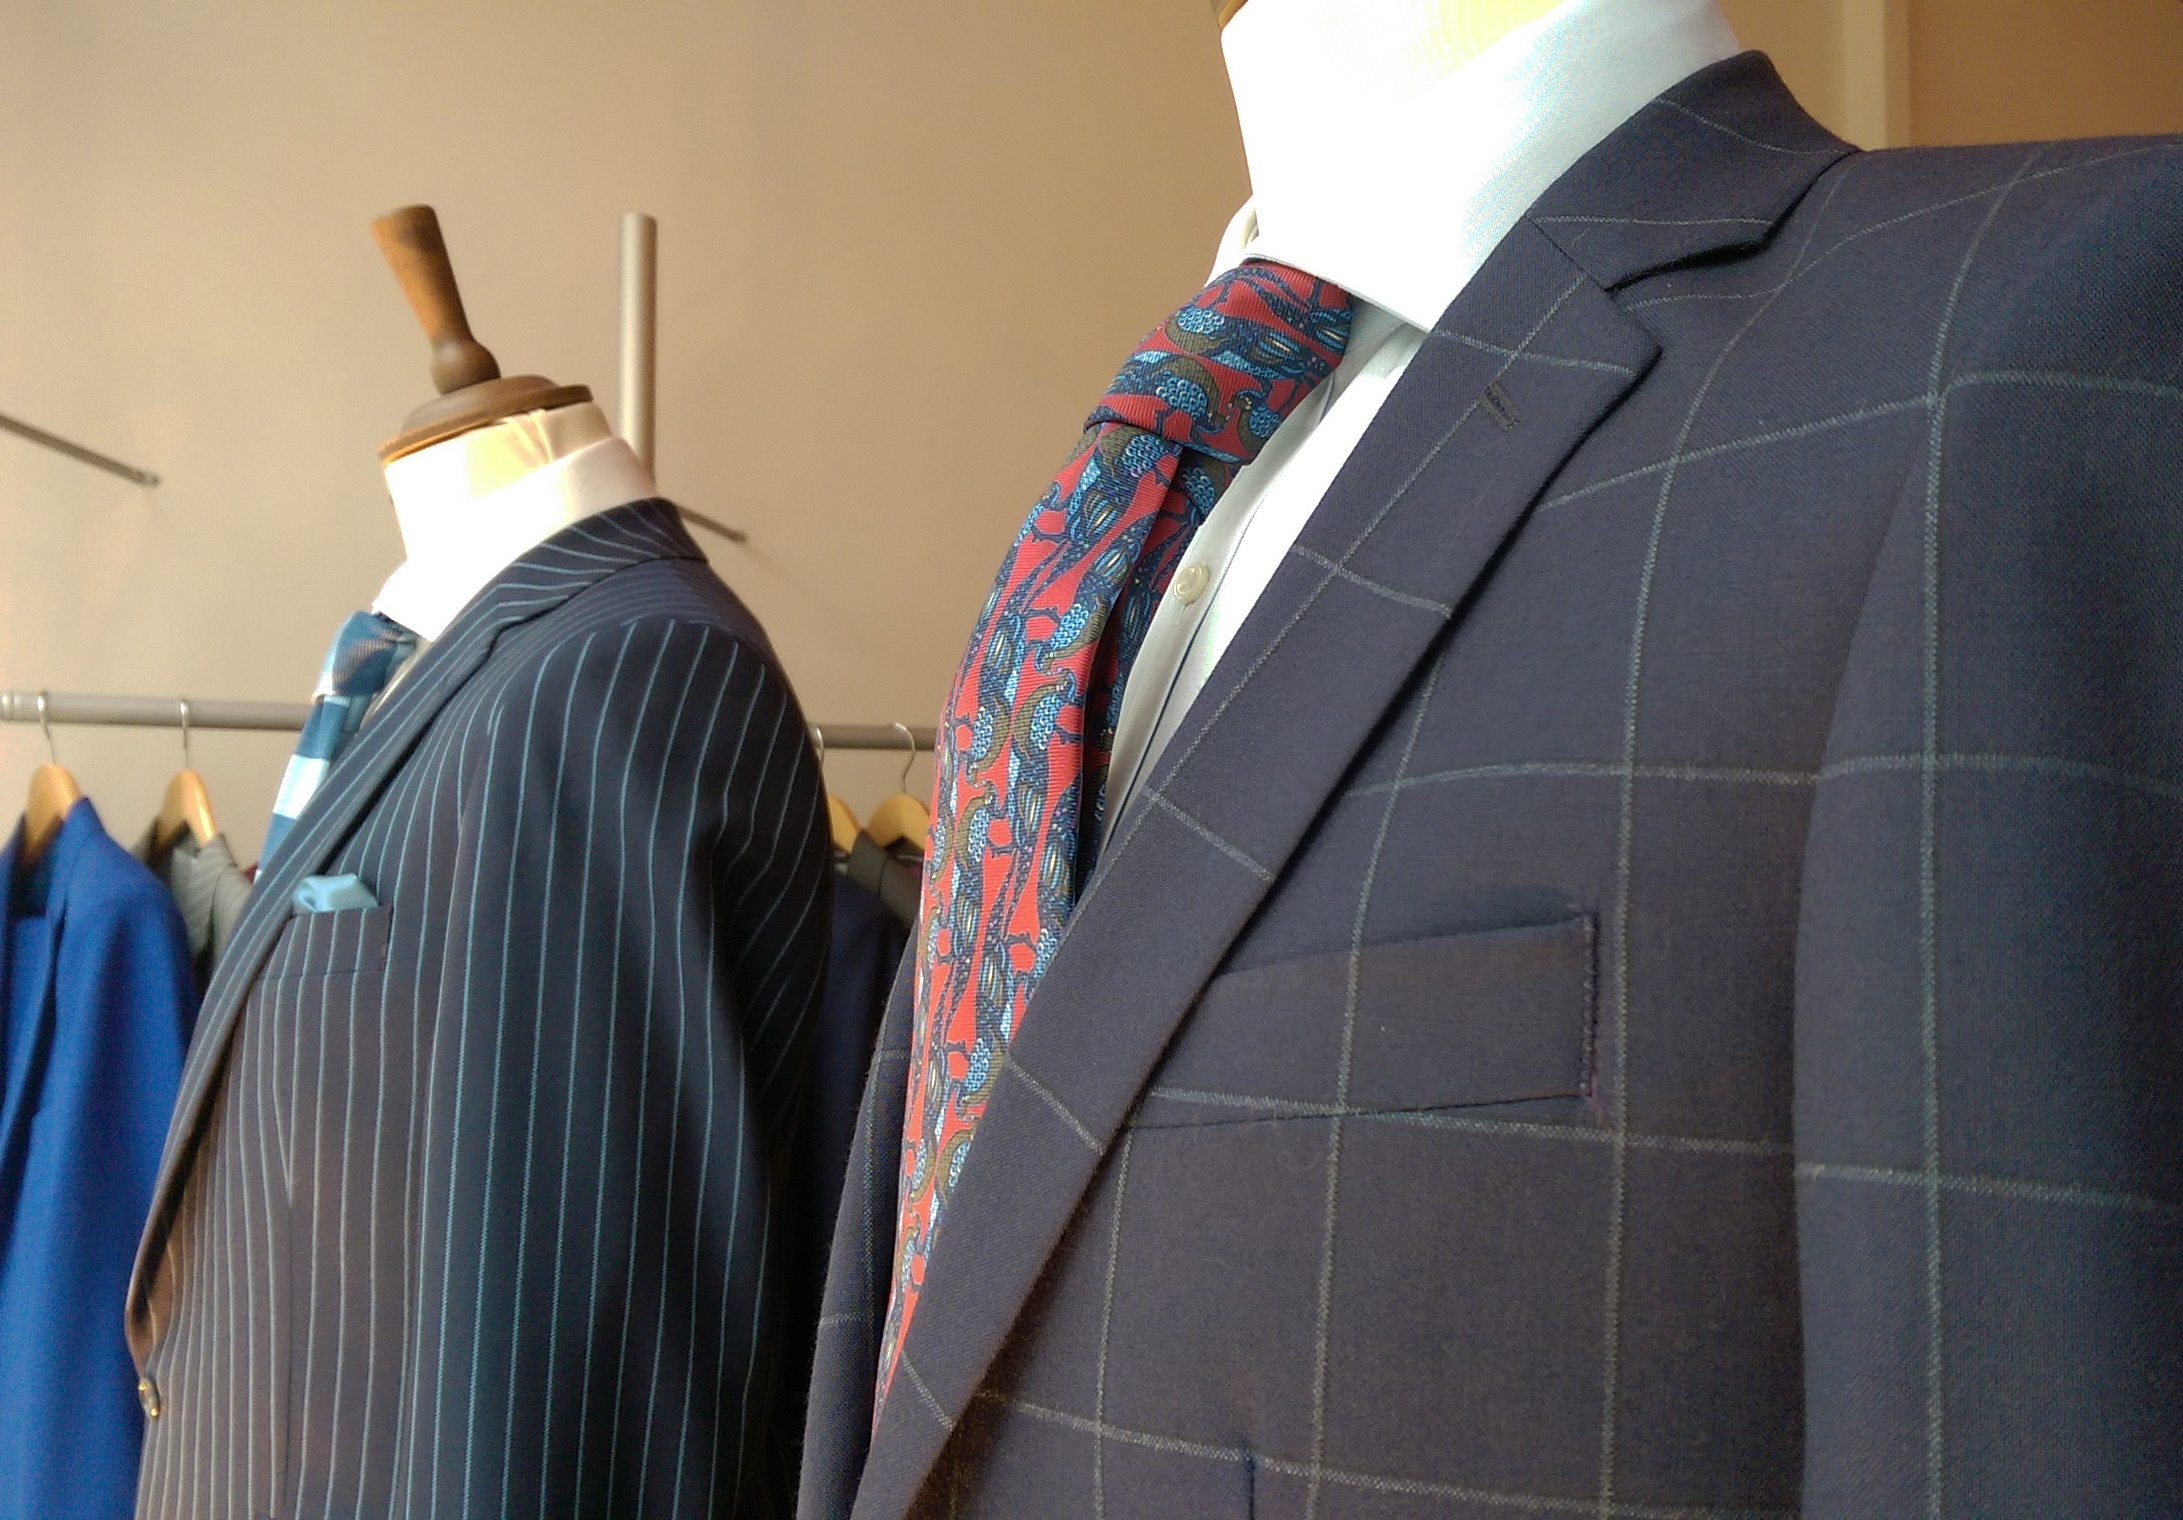 susannah-hall-bespoke-tailor-suits-navy-chalk-window-harrisons-made-britain-uk.jpg